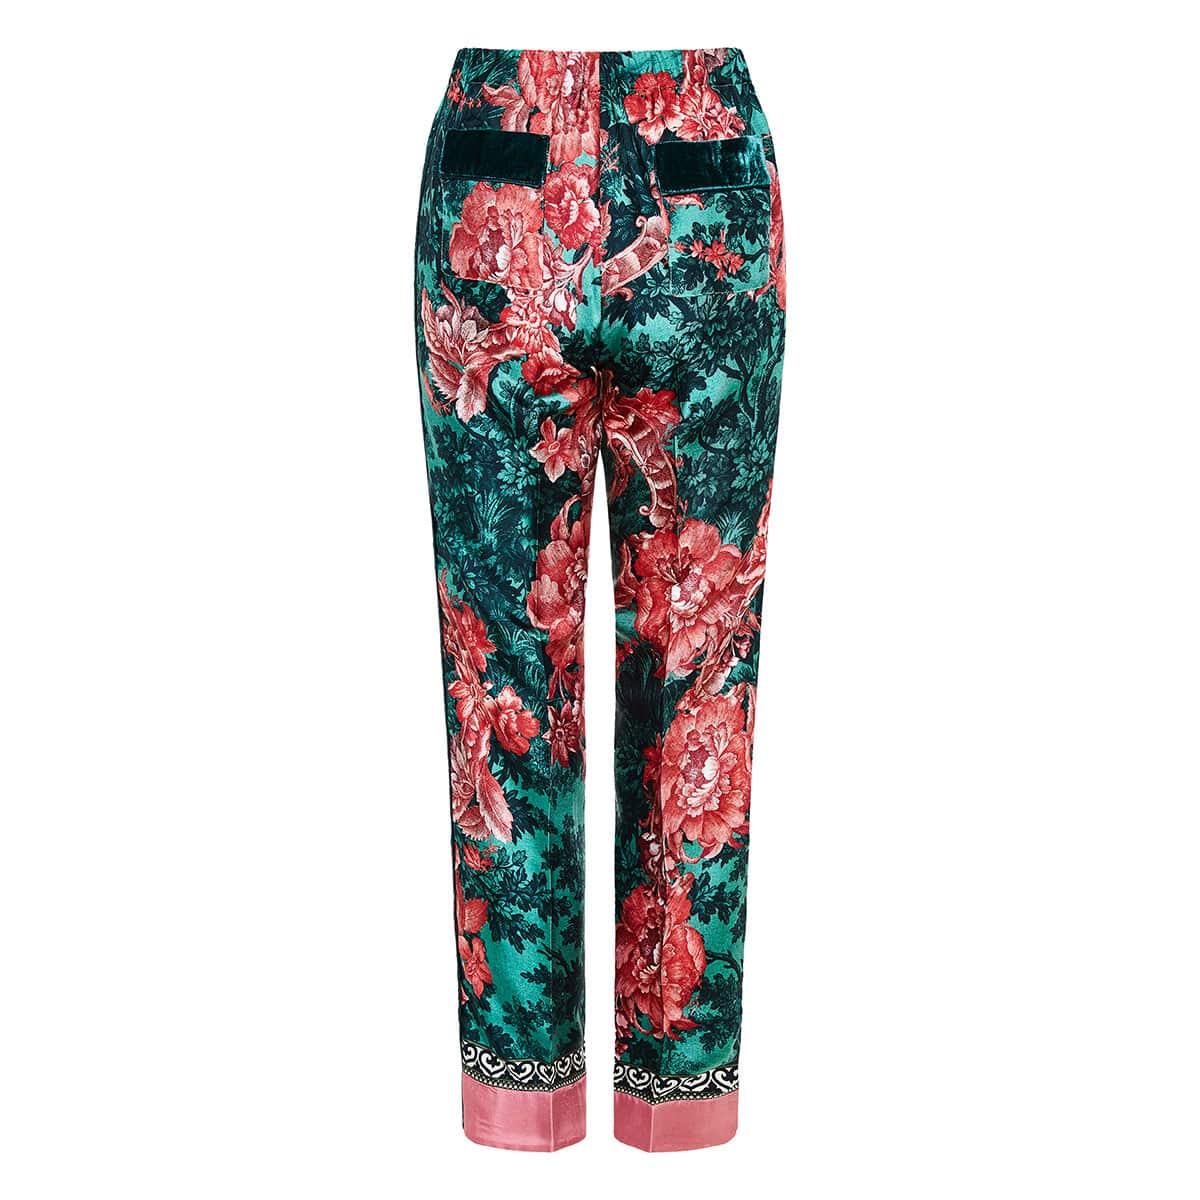 Etere printed pajama trousers